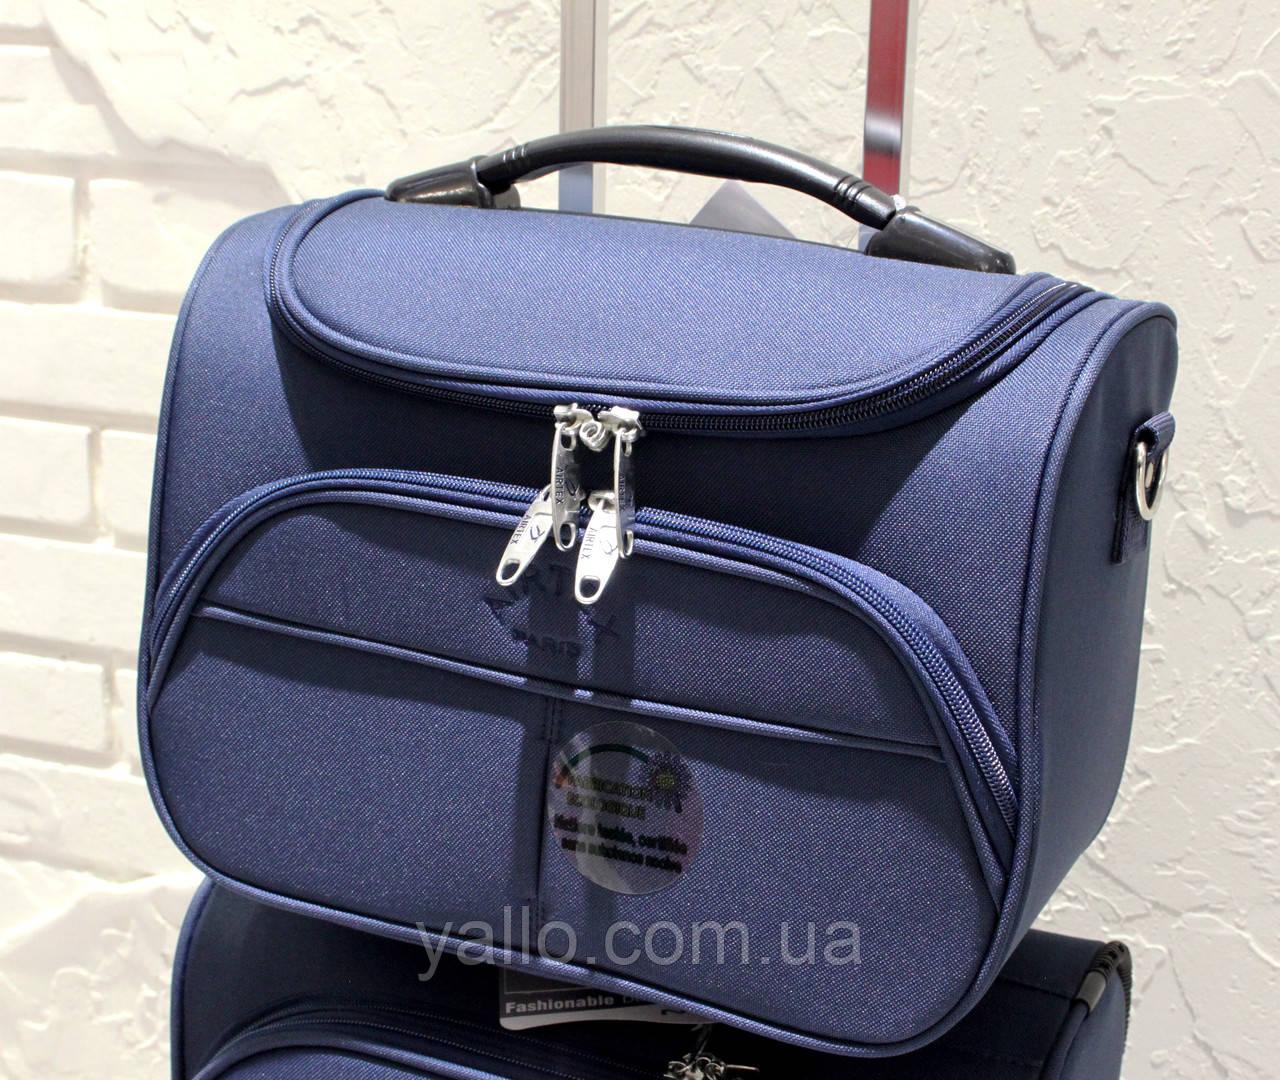 Бьюти-кейс (сумка на чемодан, косметичка) AIRTEX 2897 Blue